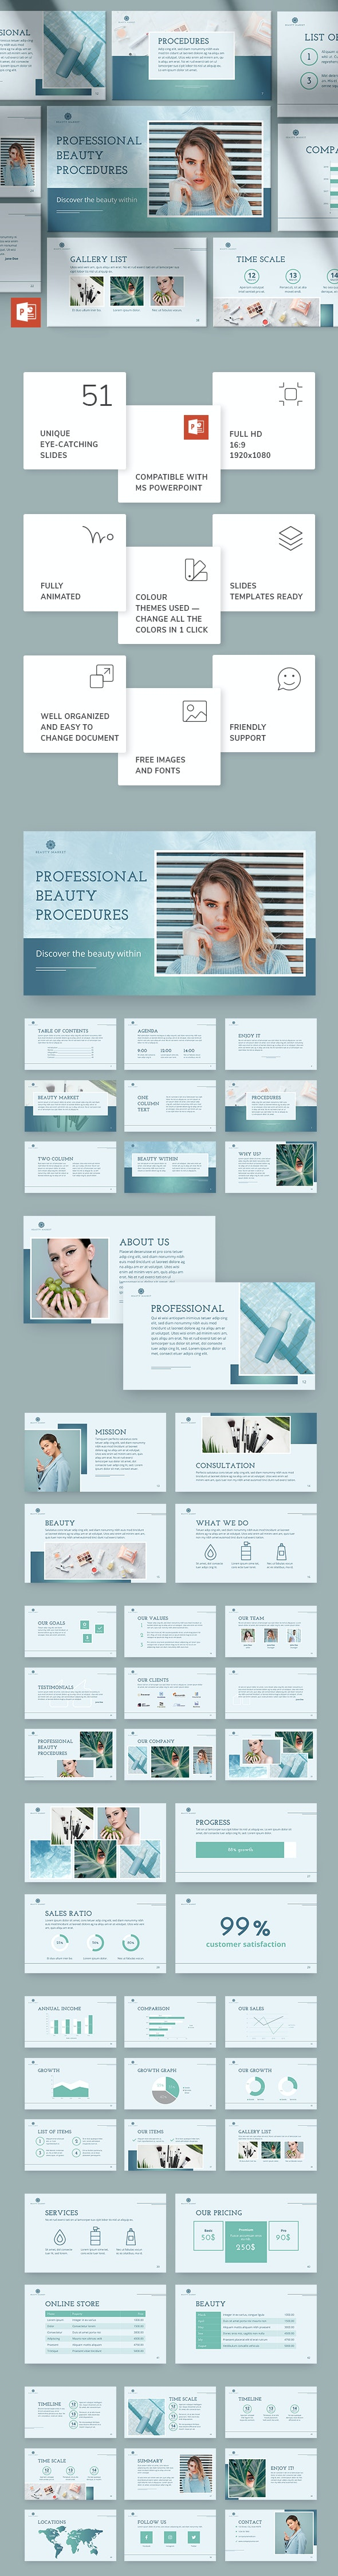 Beauty Market PowerPoint Presentation Template - Miscellaneous PowerPoint Templates